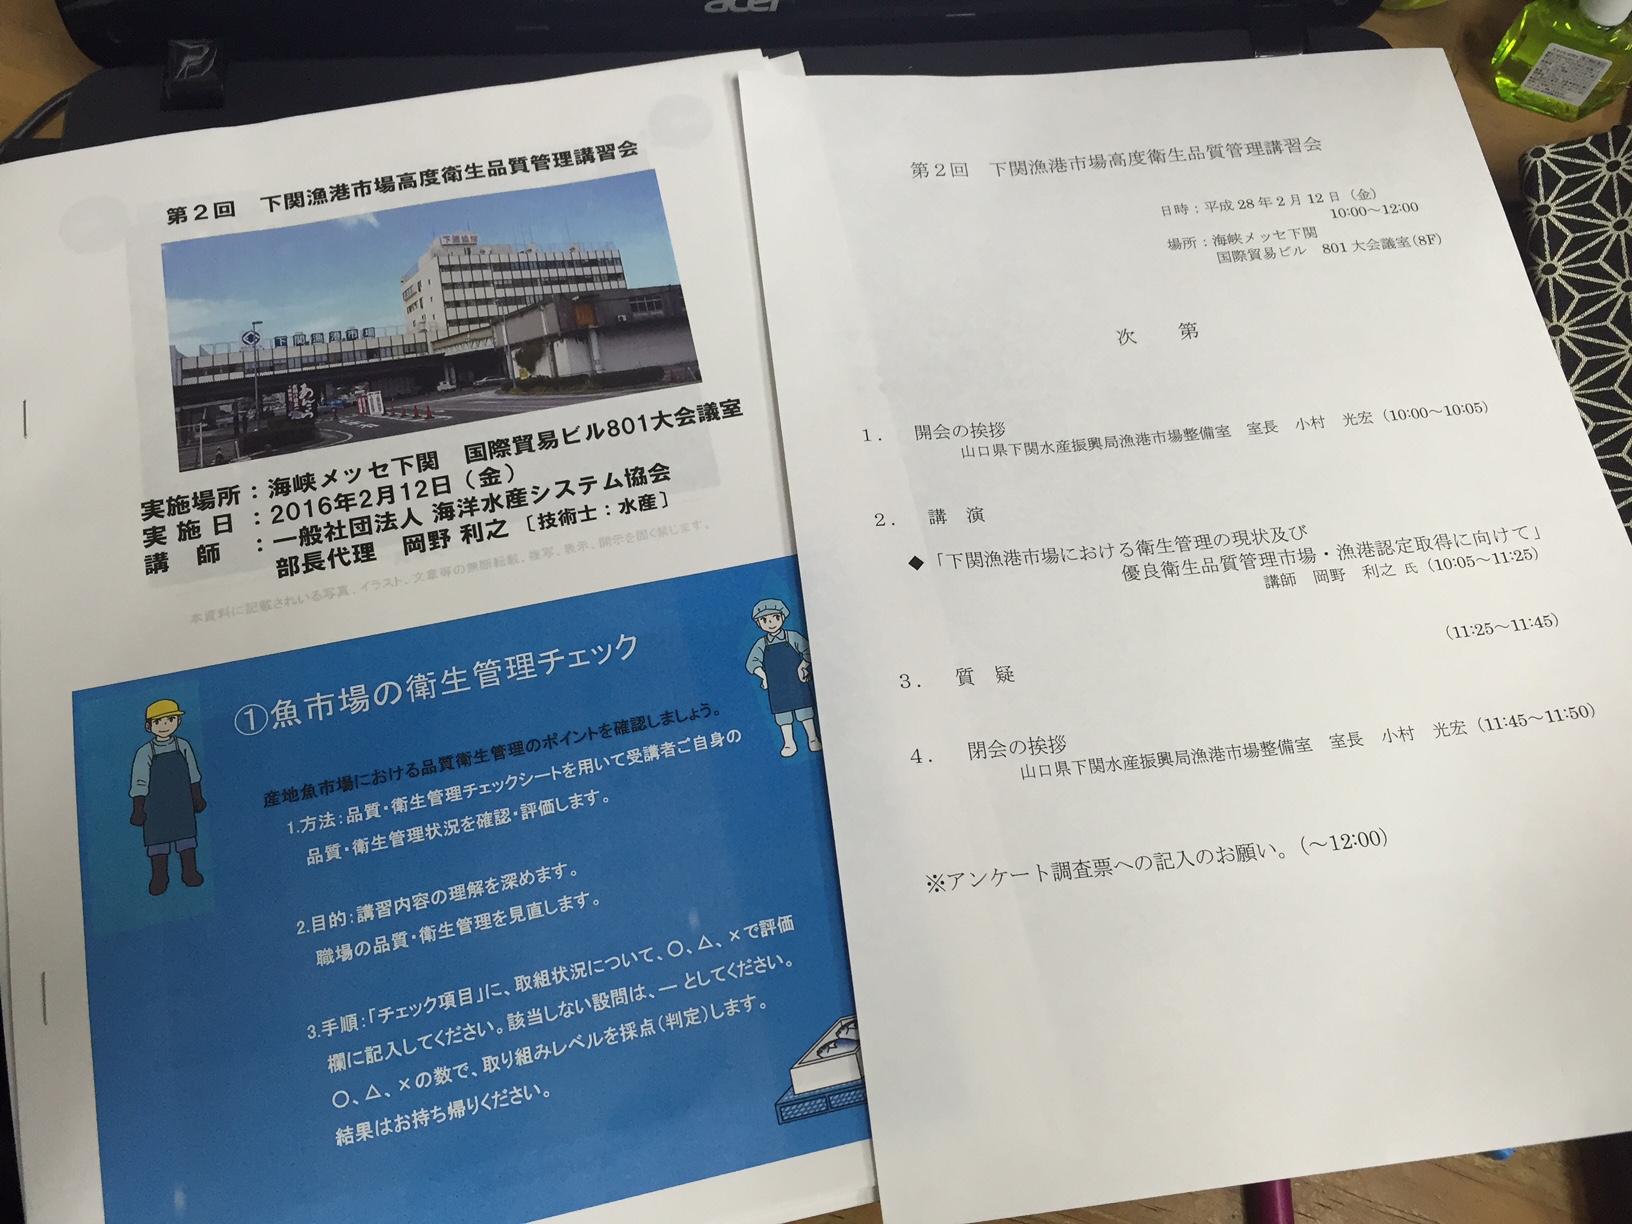 下関漁港市場高度衛生品質管理講習会のメイン画像